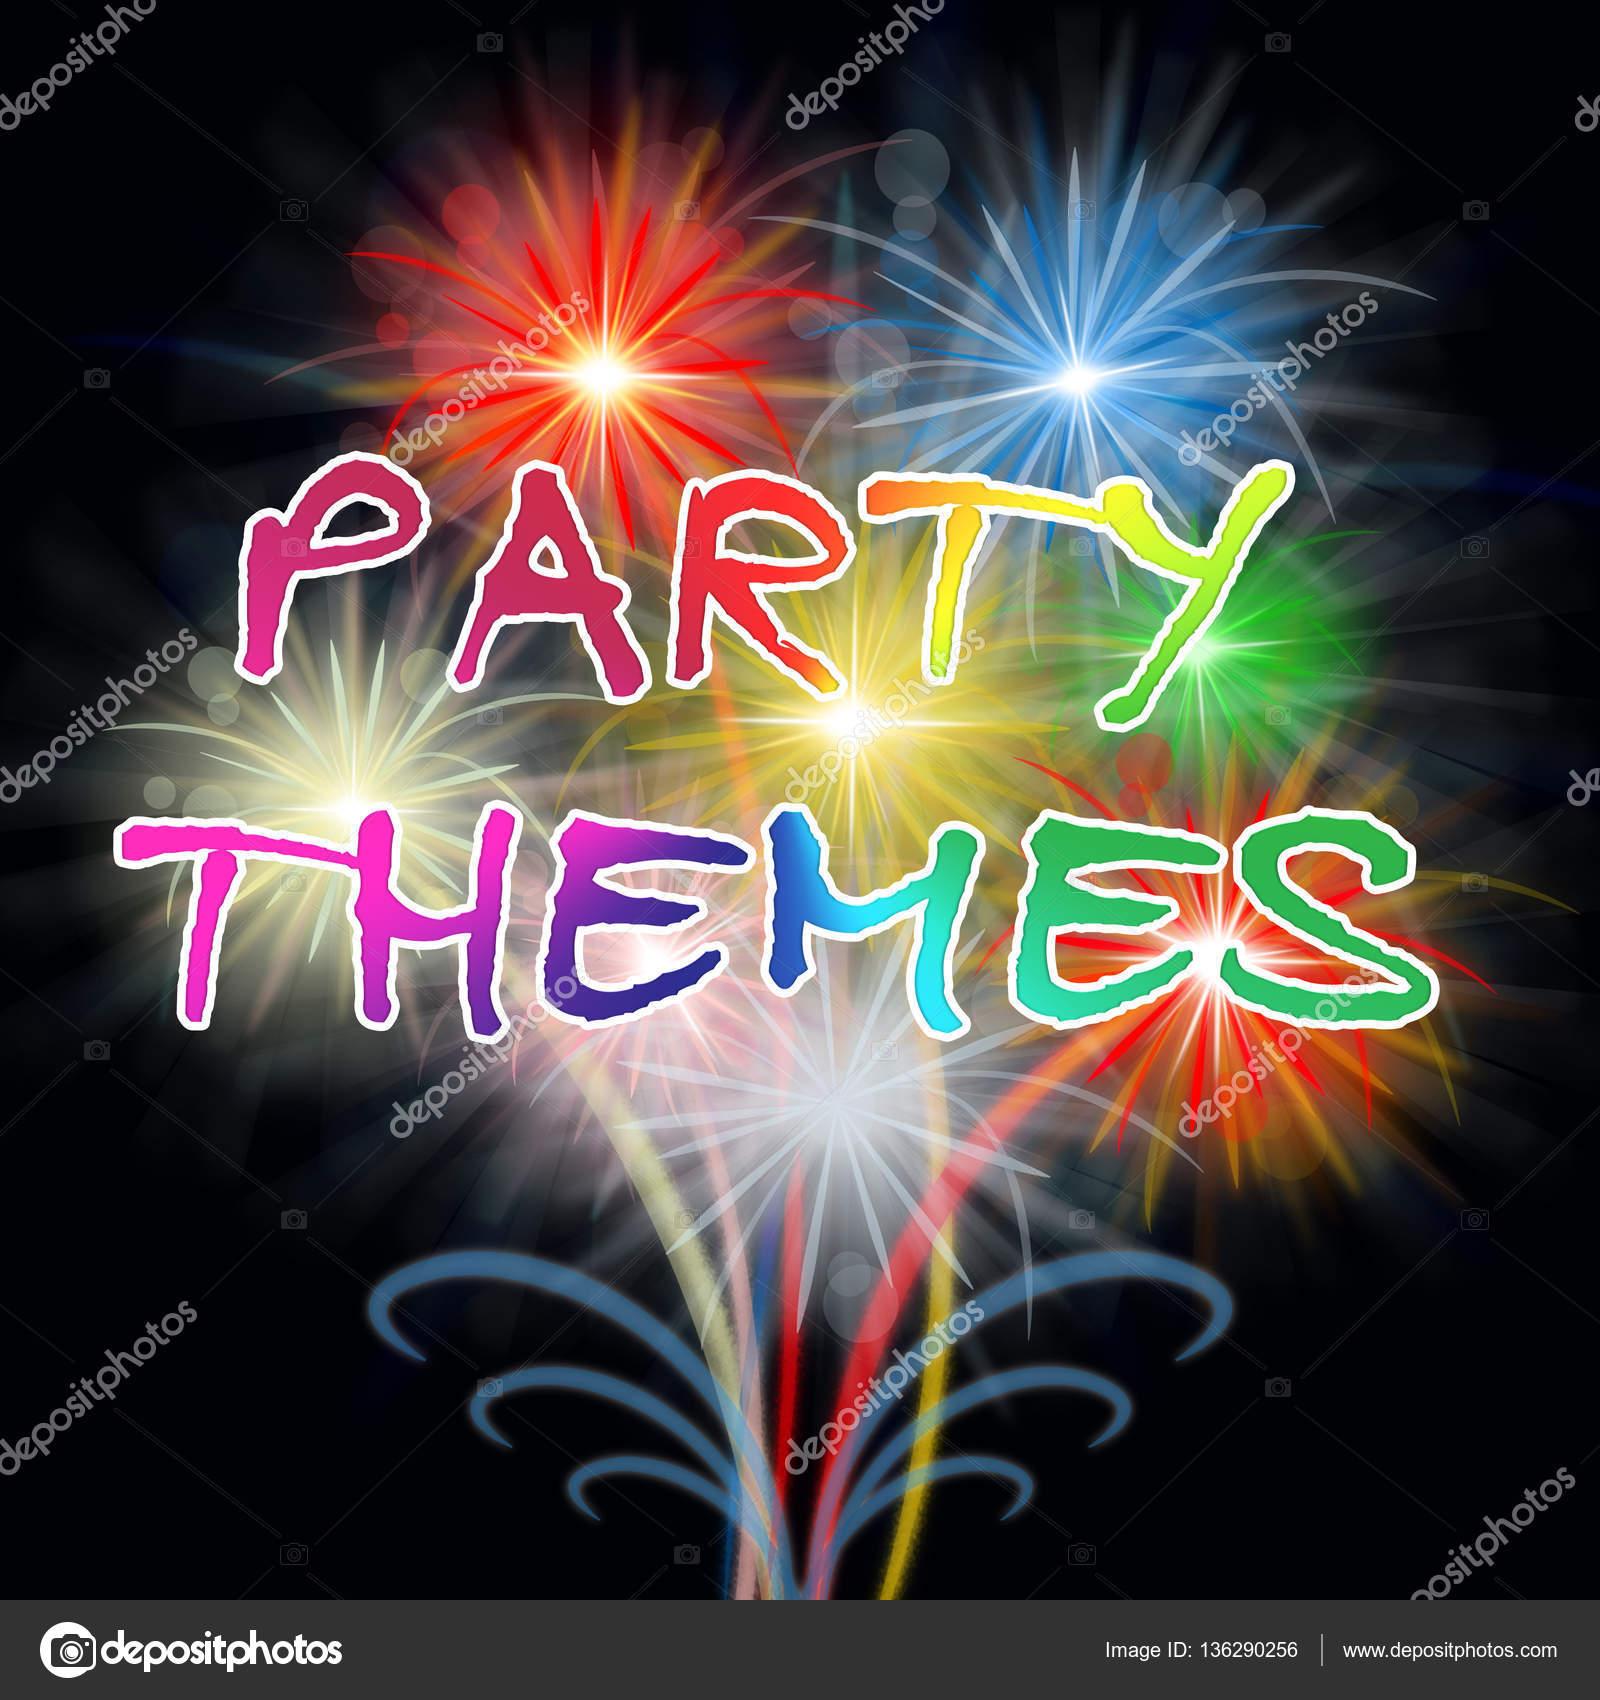 party themes indicates celebration ideas and festivity stock photo